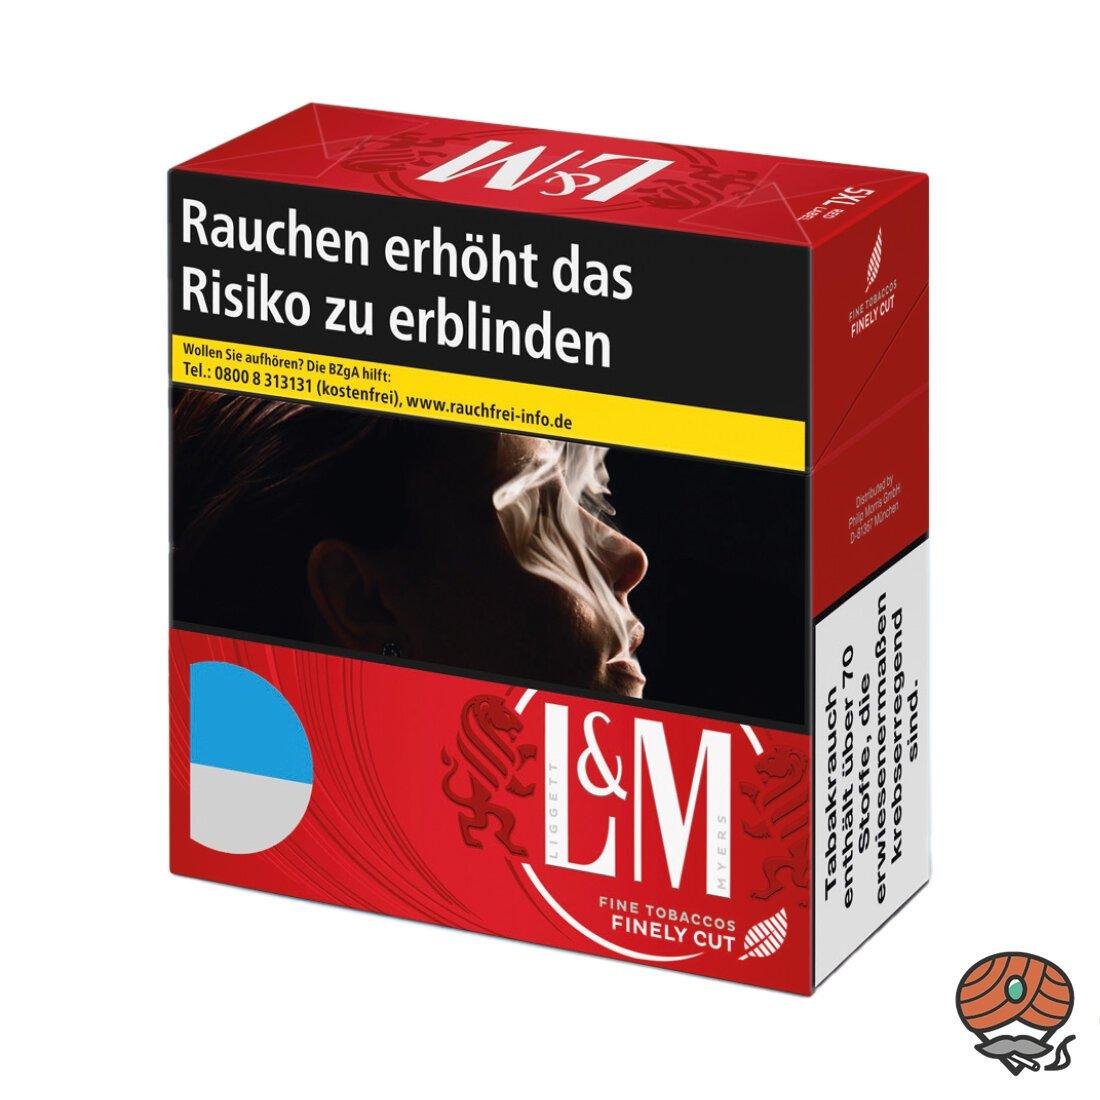 L&M Red / Rot Label 5XL Inhalt 49 Stück